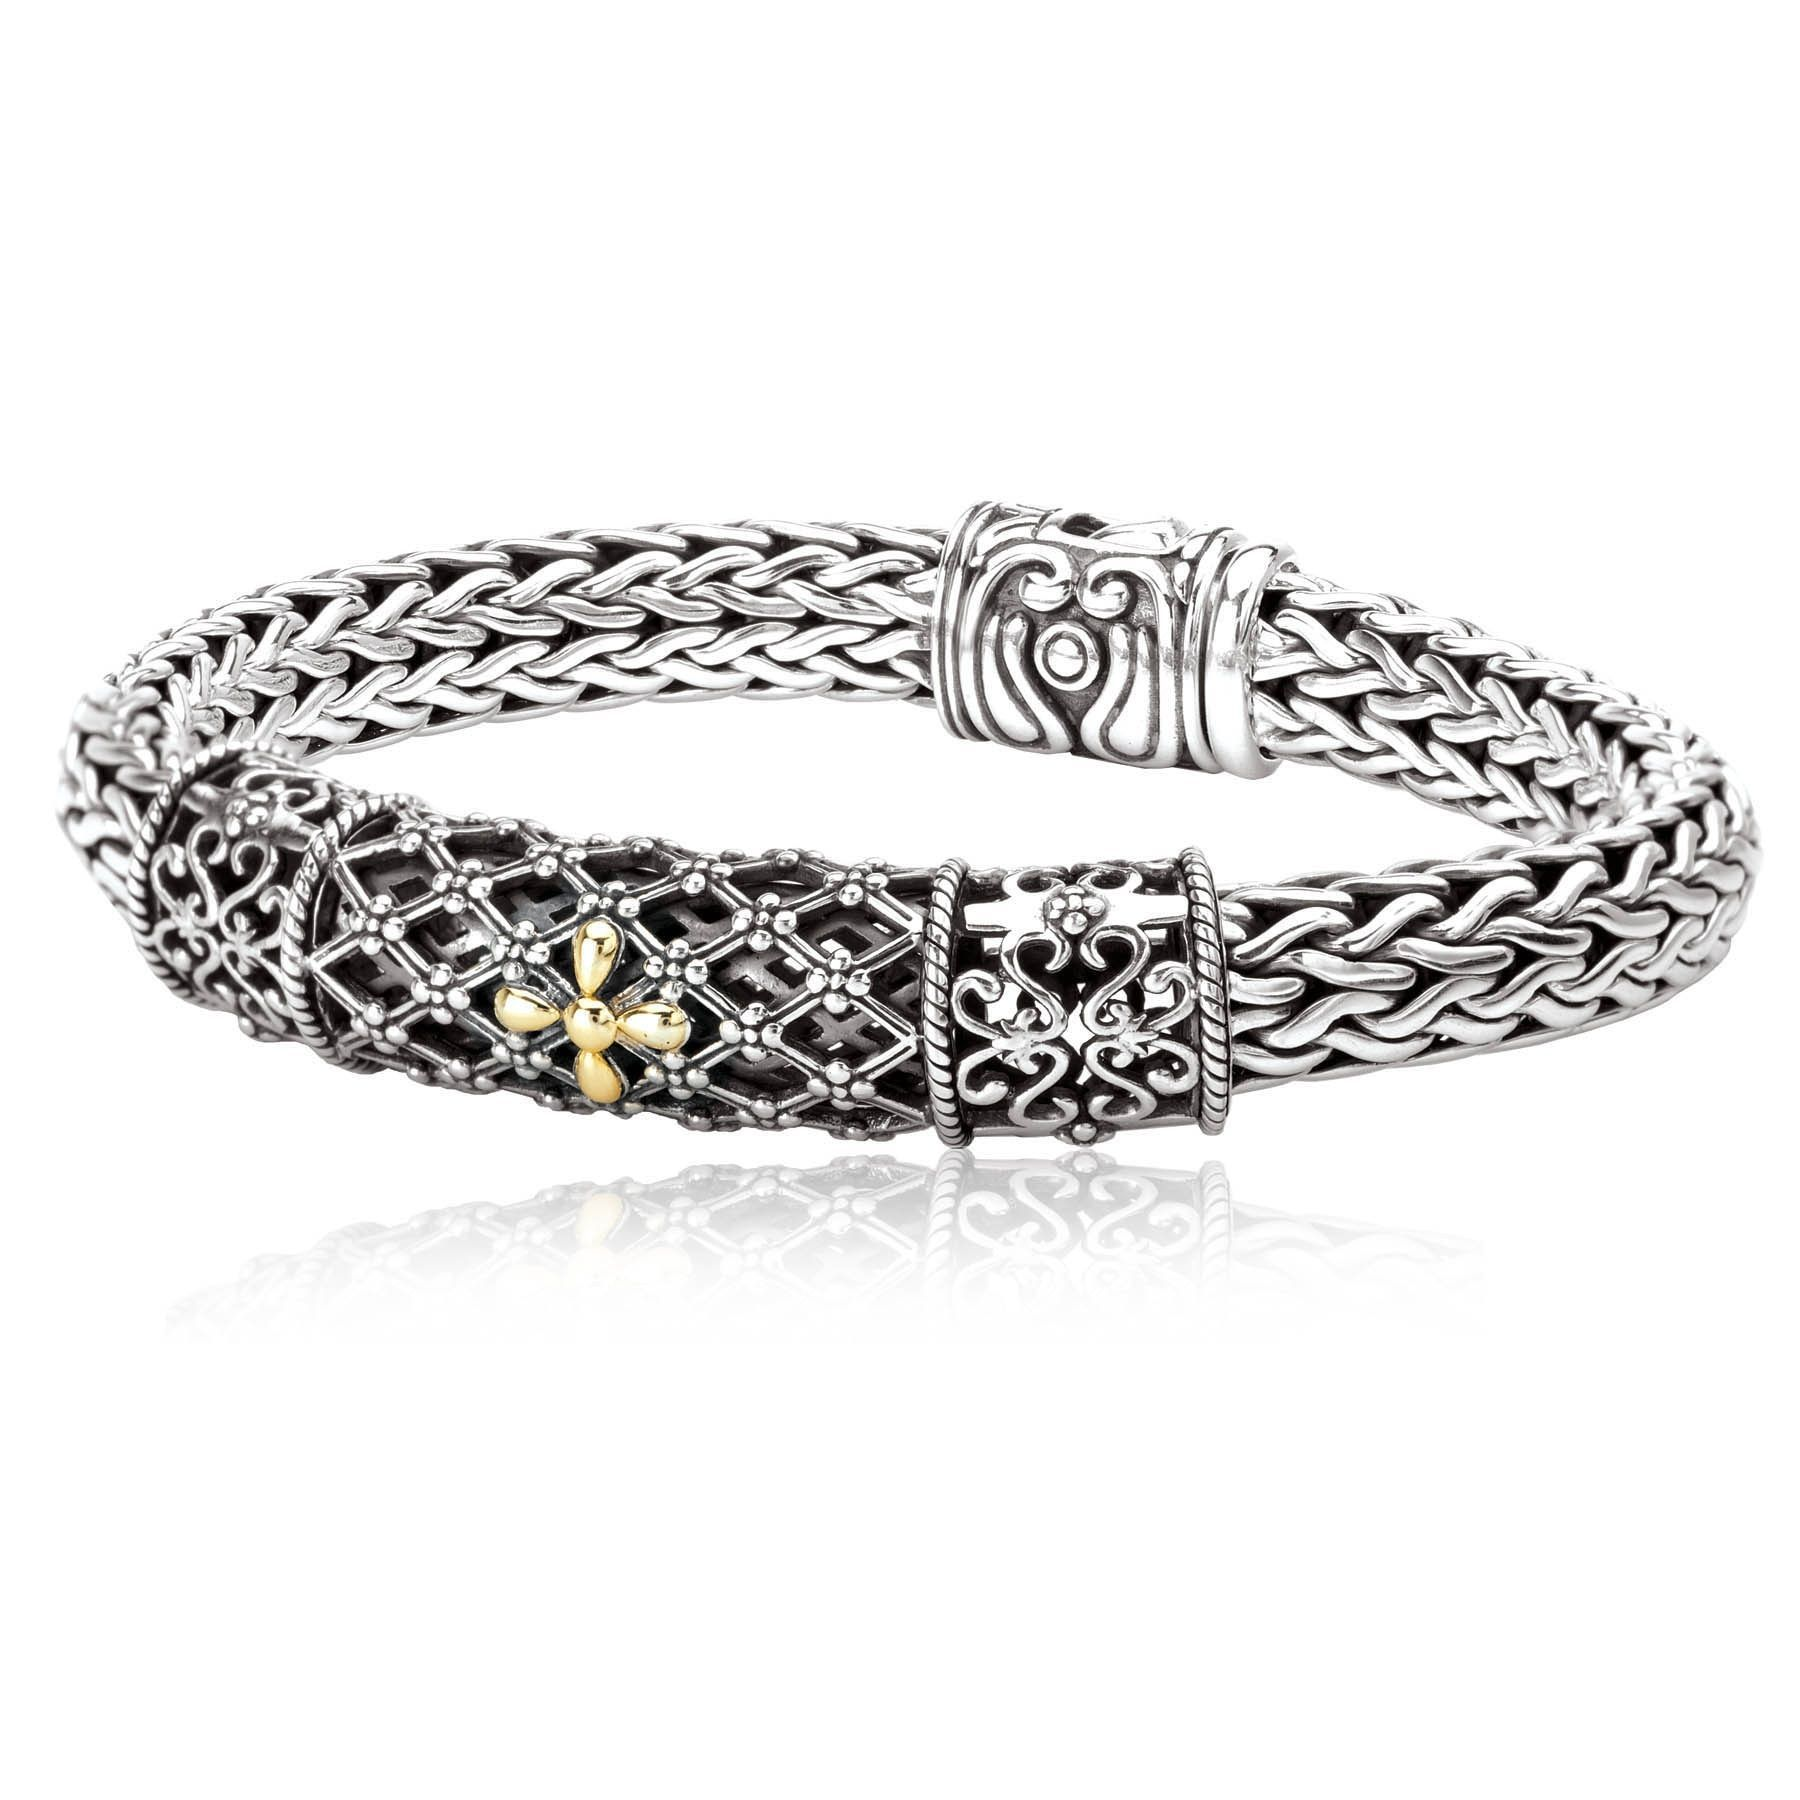 Avanti sterling silver and k yellow gold filigree design bracelet